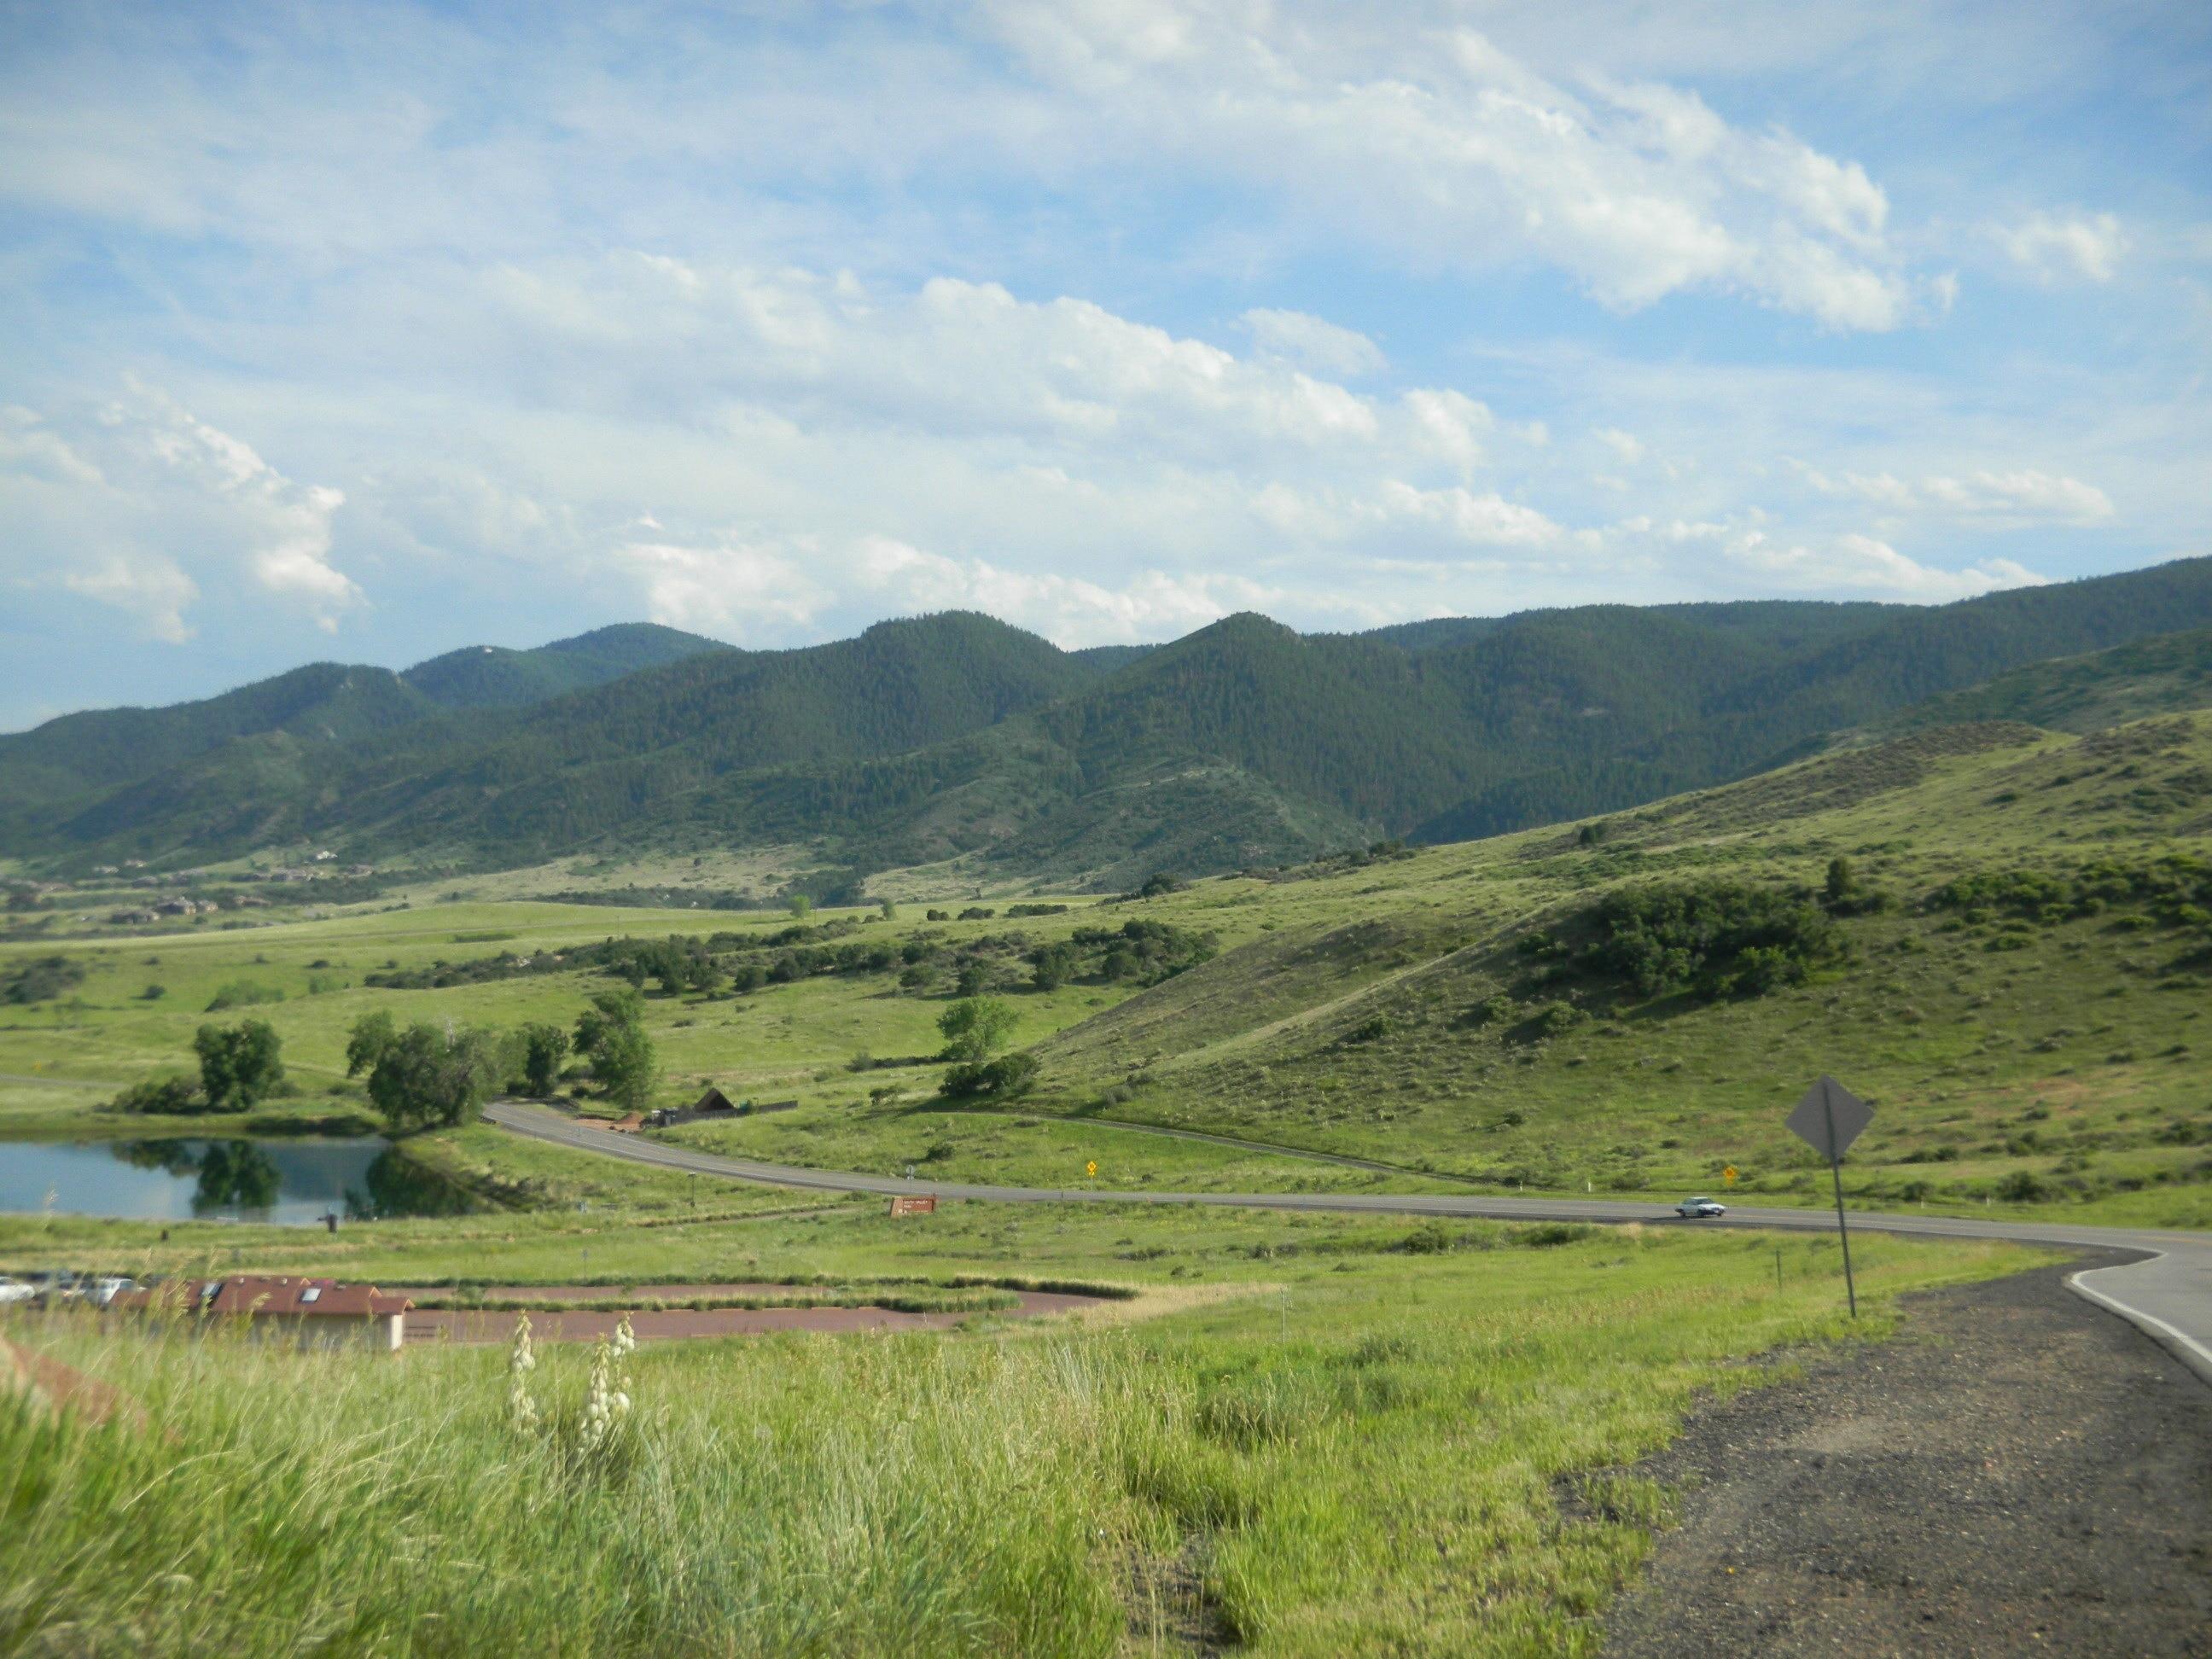 Ken Caryl, Colorado, United States of America